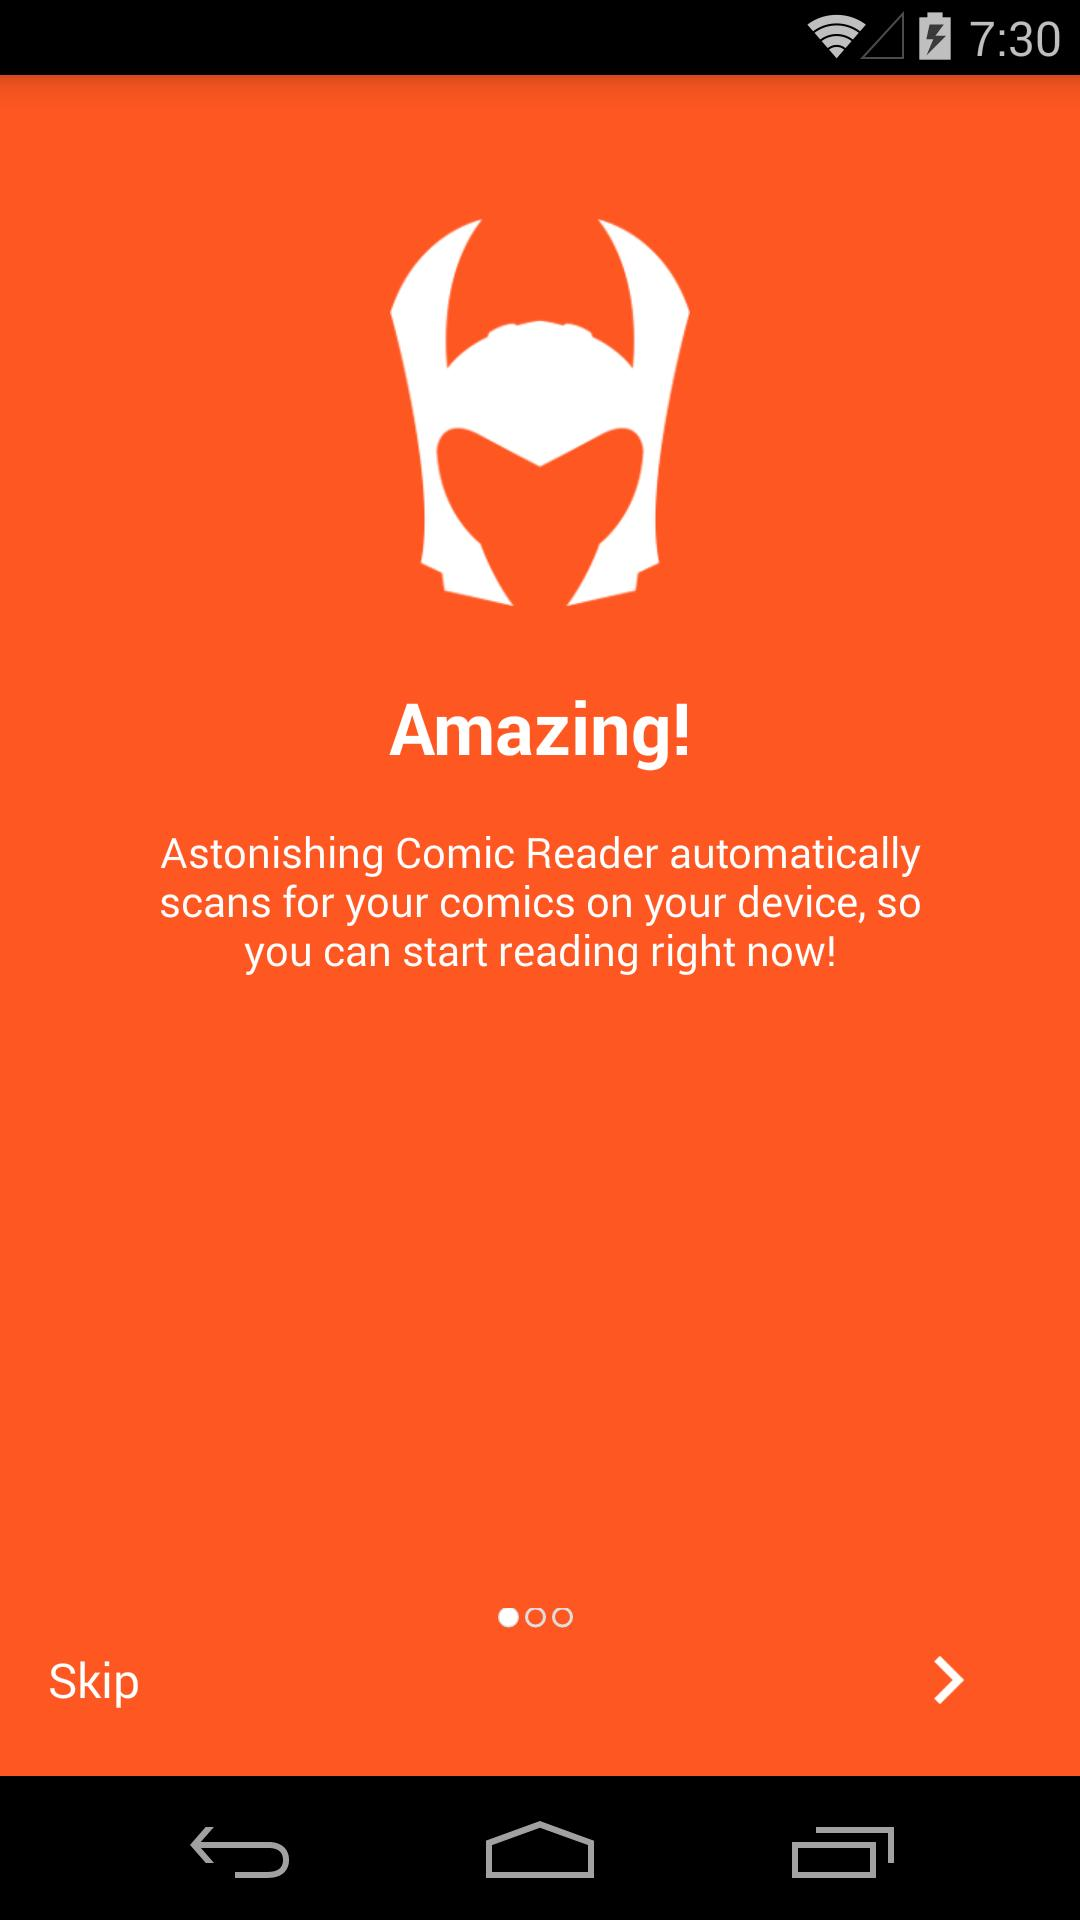 Astonishing Comic Reader 3.32 Screenshot 1